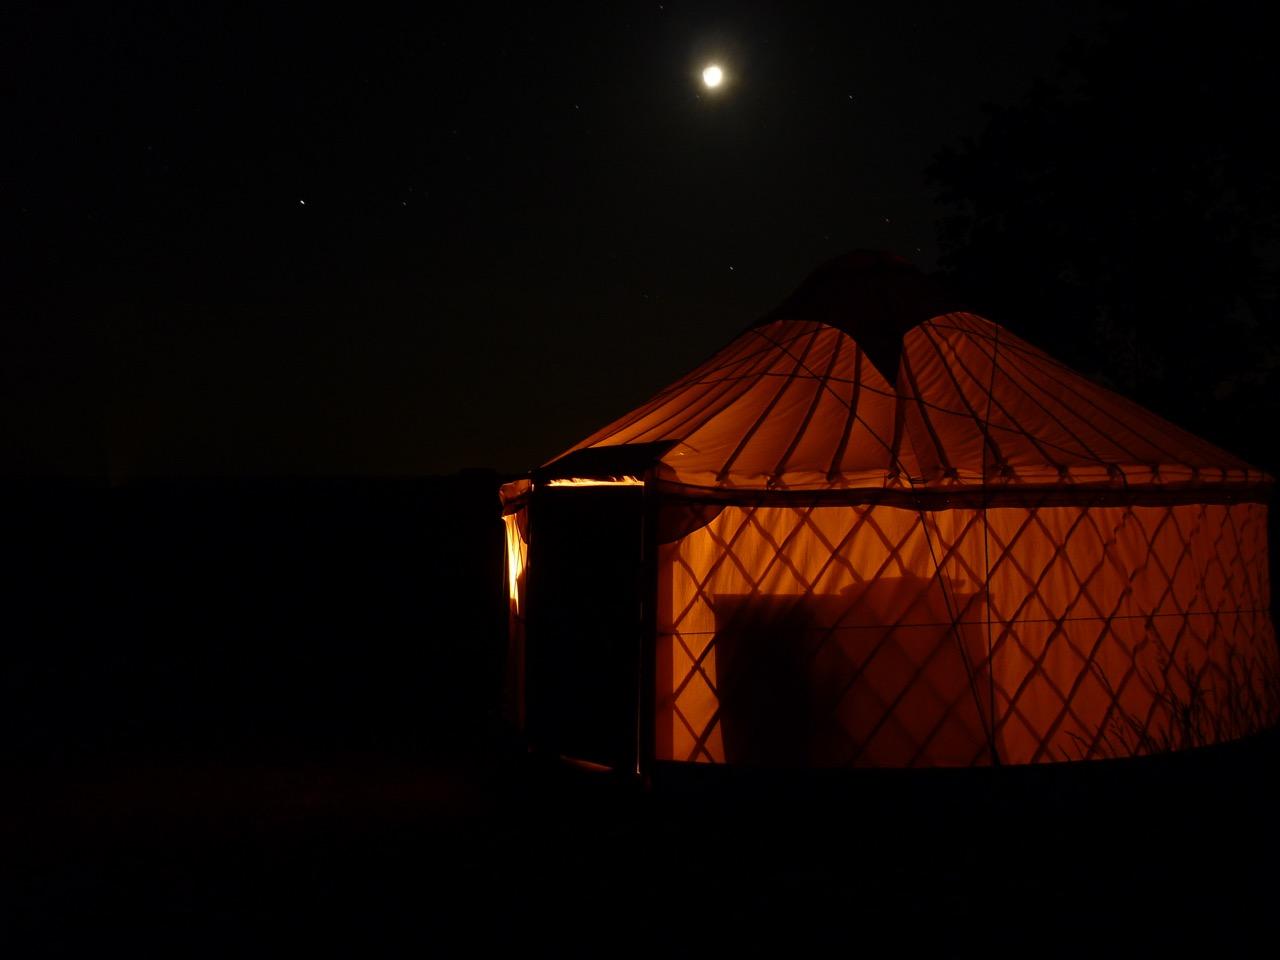 P1020366 Night glow